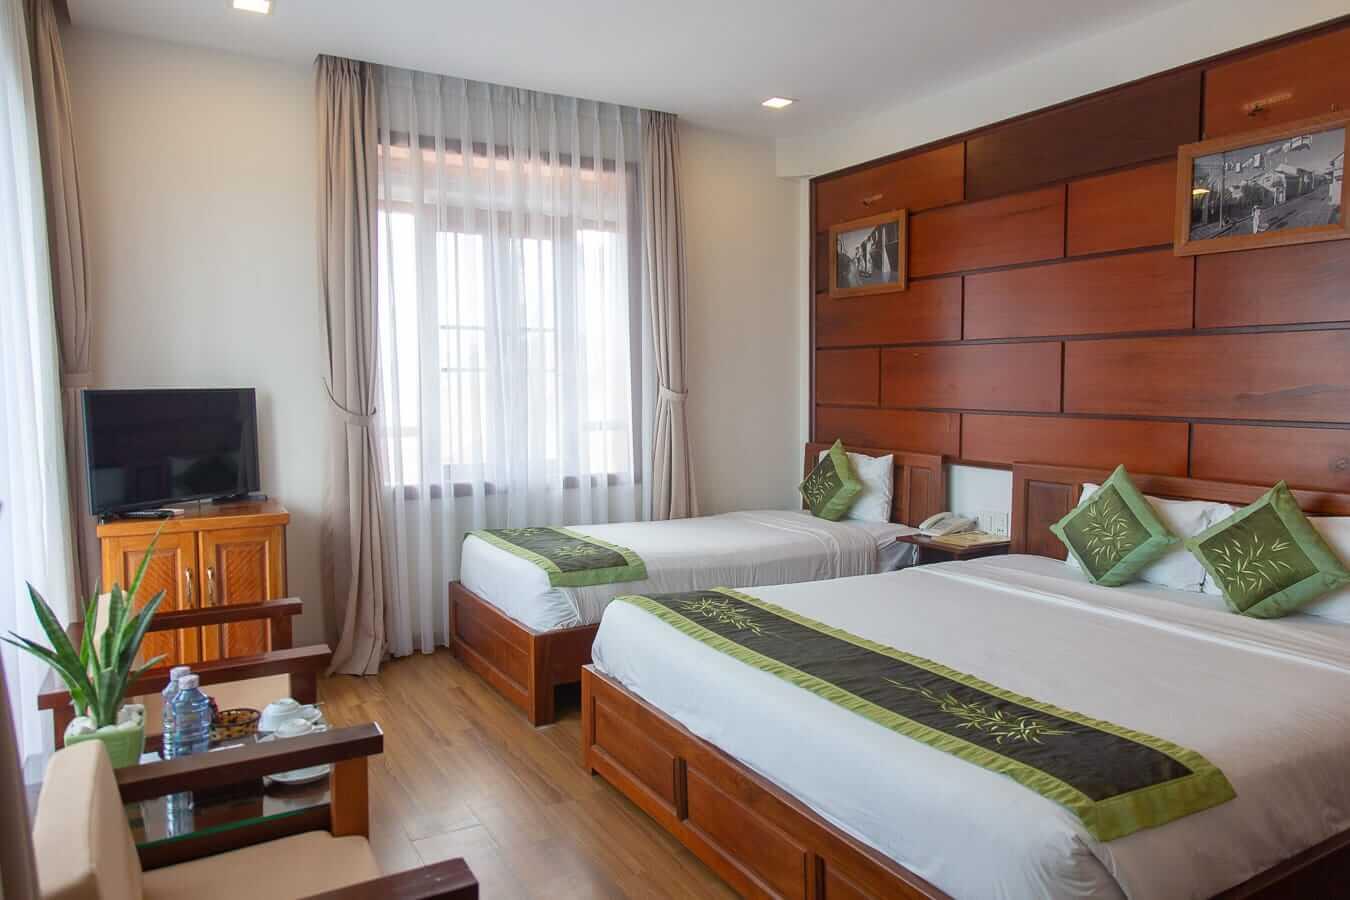 Kiman Hotel: Best Hoi An hotels